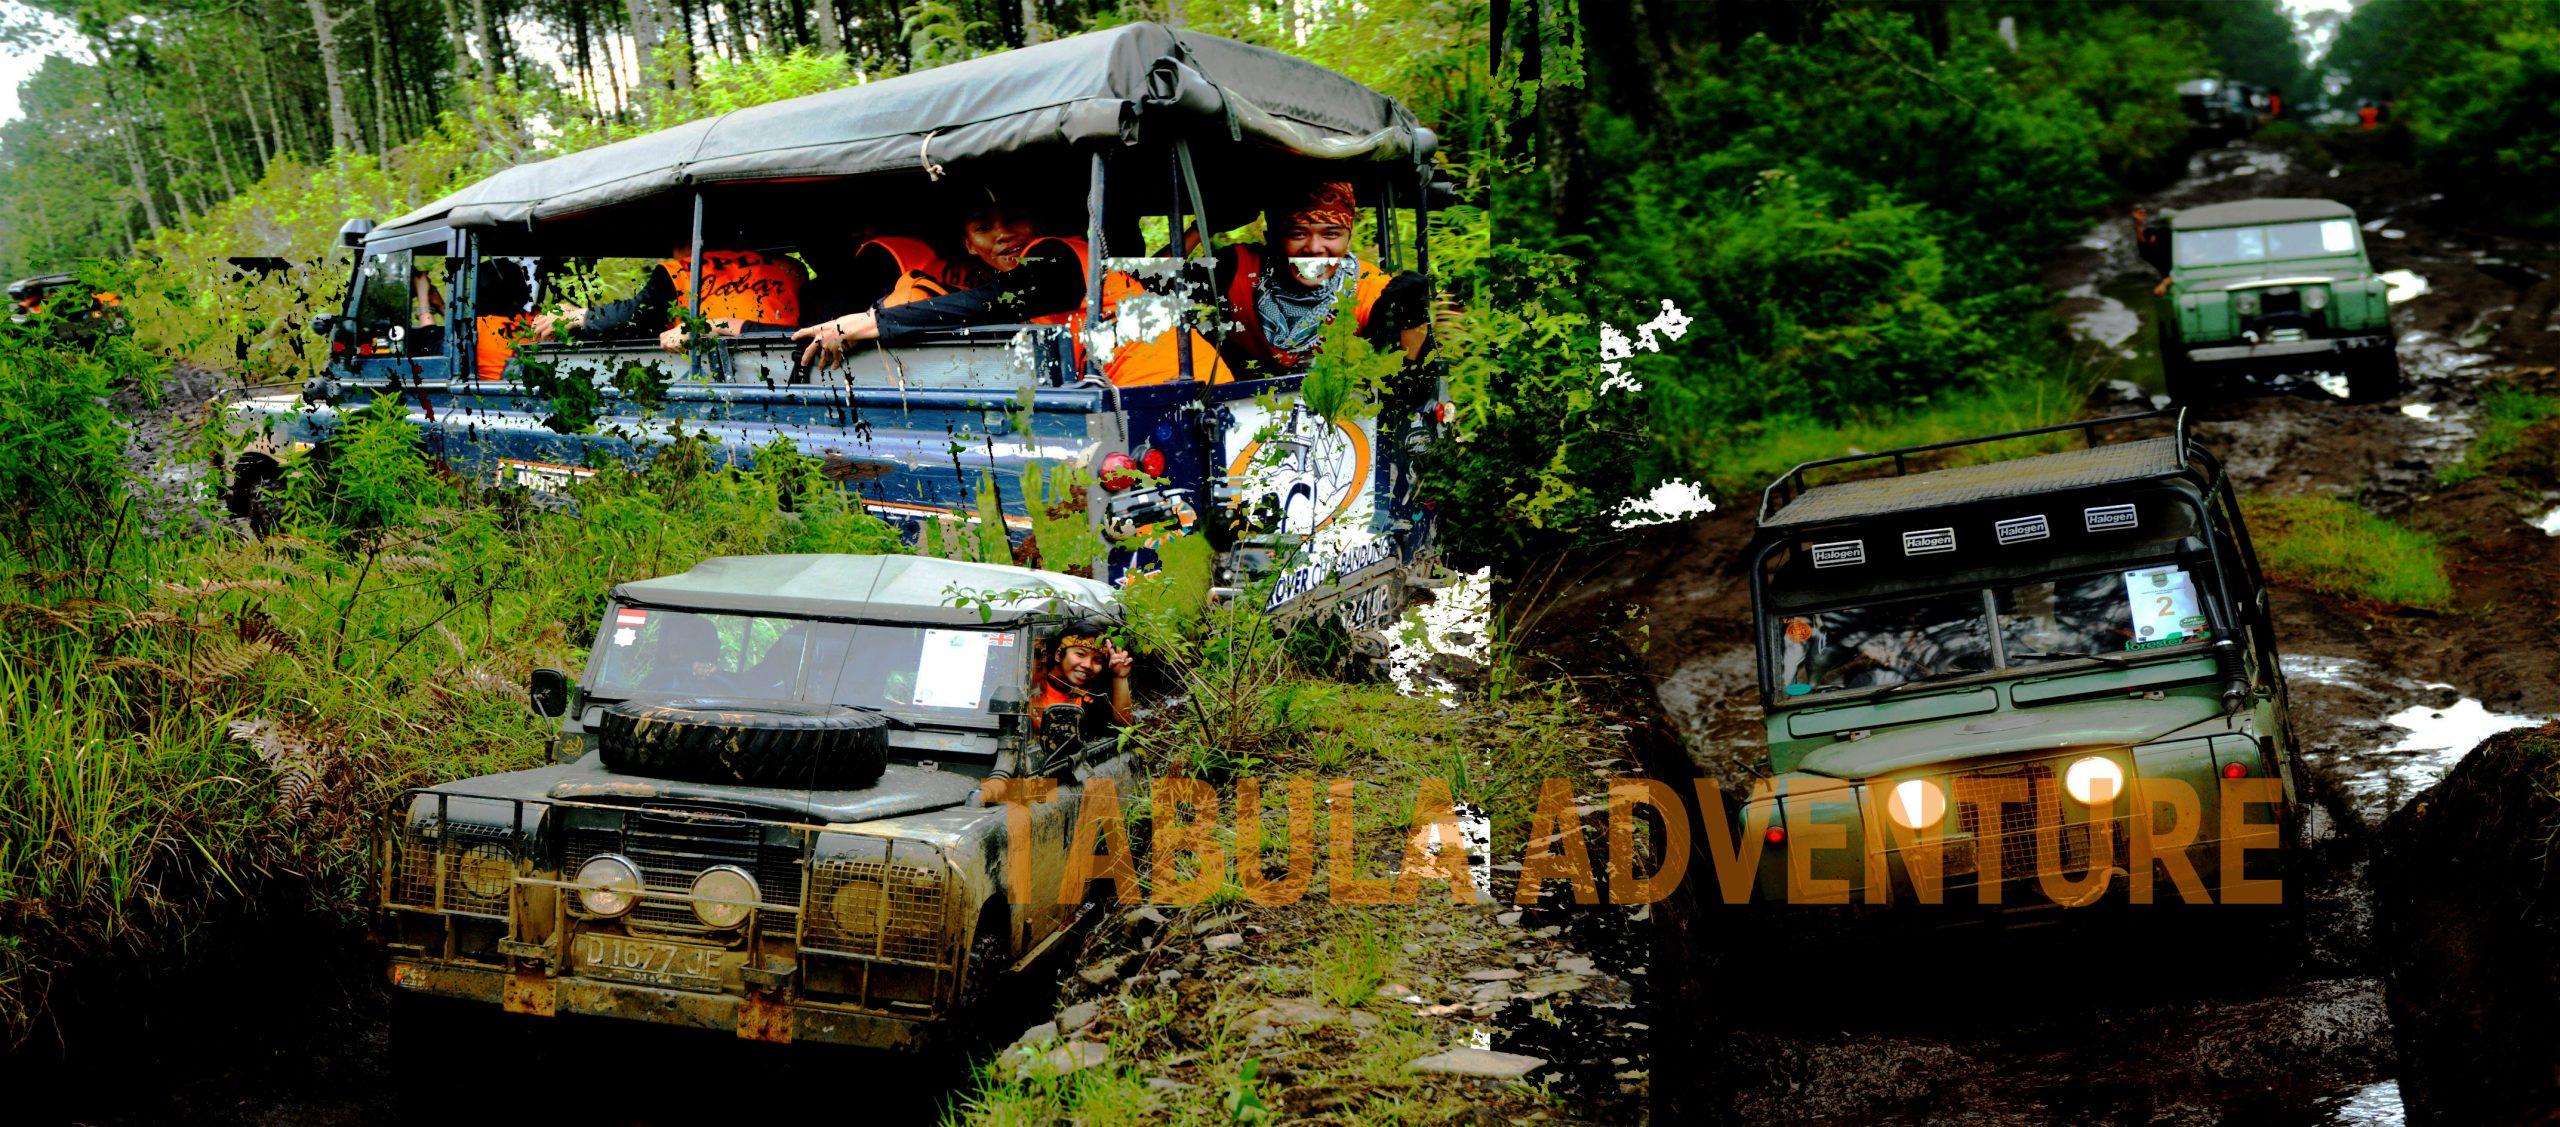 Wisata Off Road Land Rover Terdampak Pandemi Covid-19